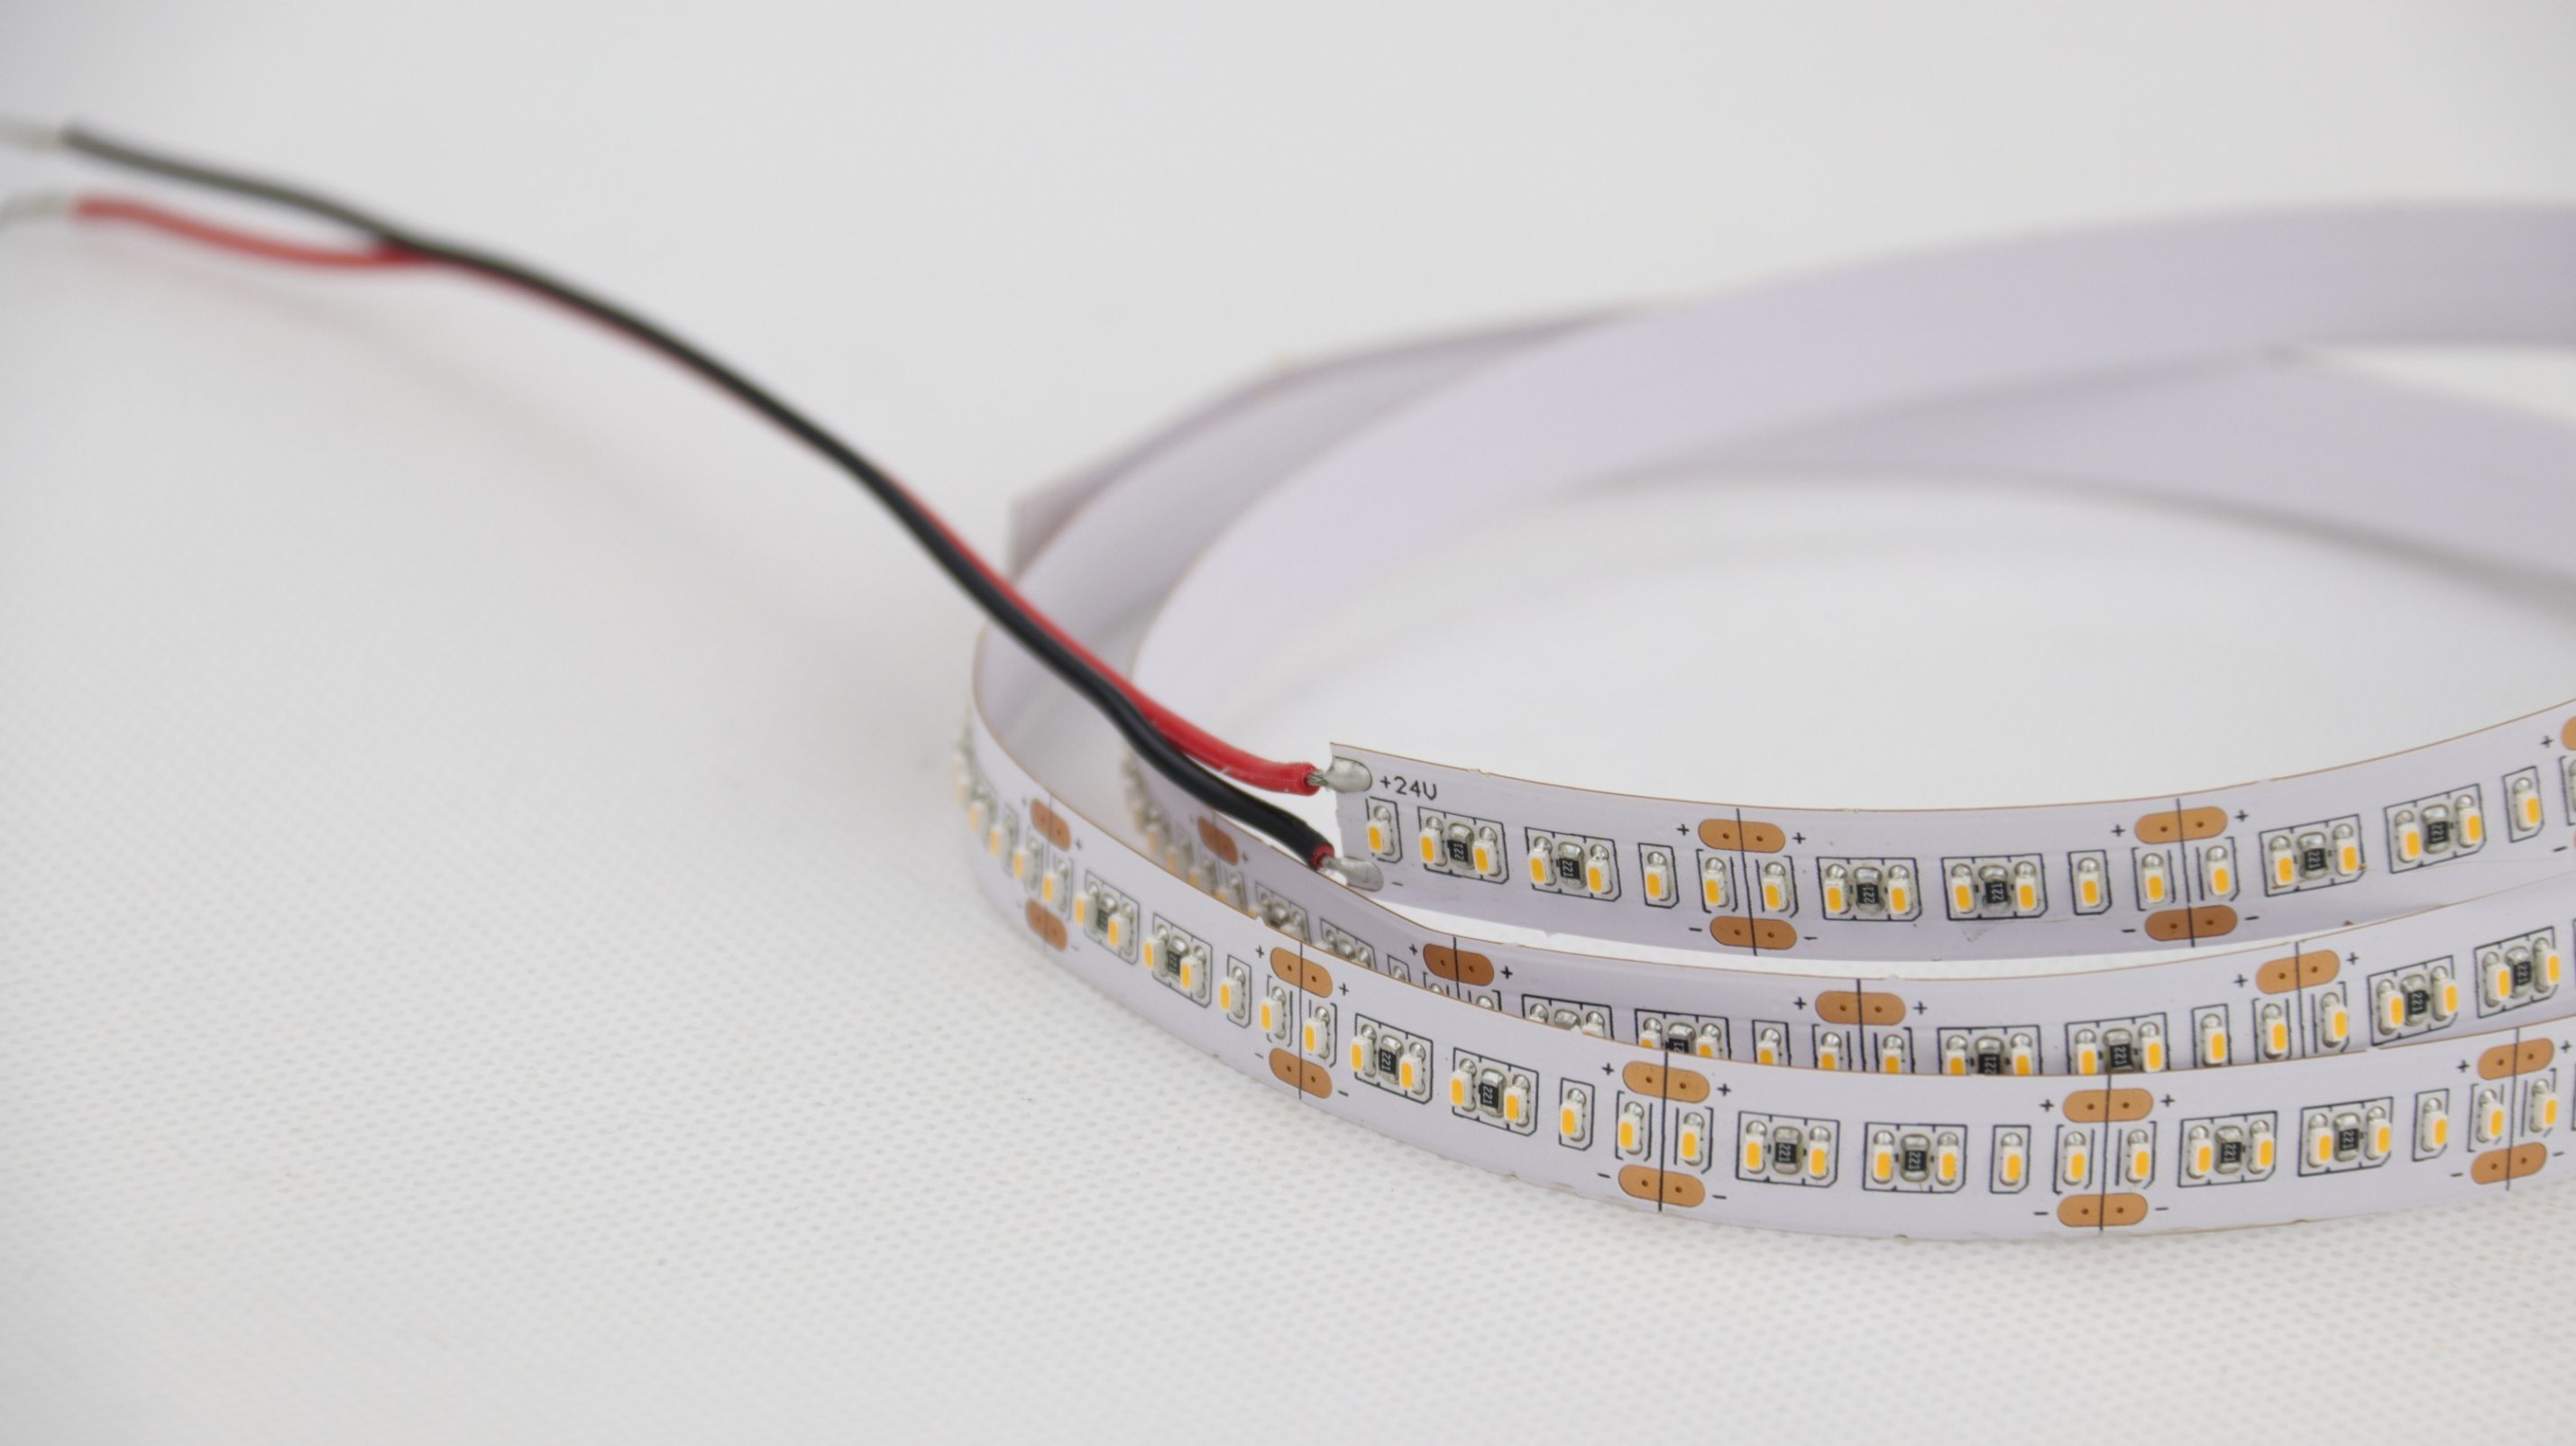 China 2018 Newest Flexible Led Strip Smd2110 280leds M Smd Wiring Light Long Life High Brightness 12v 24v Rope